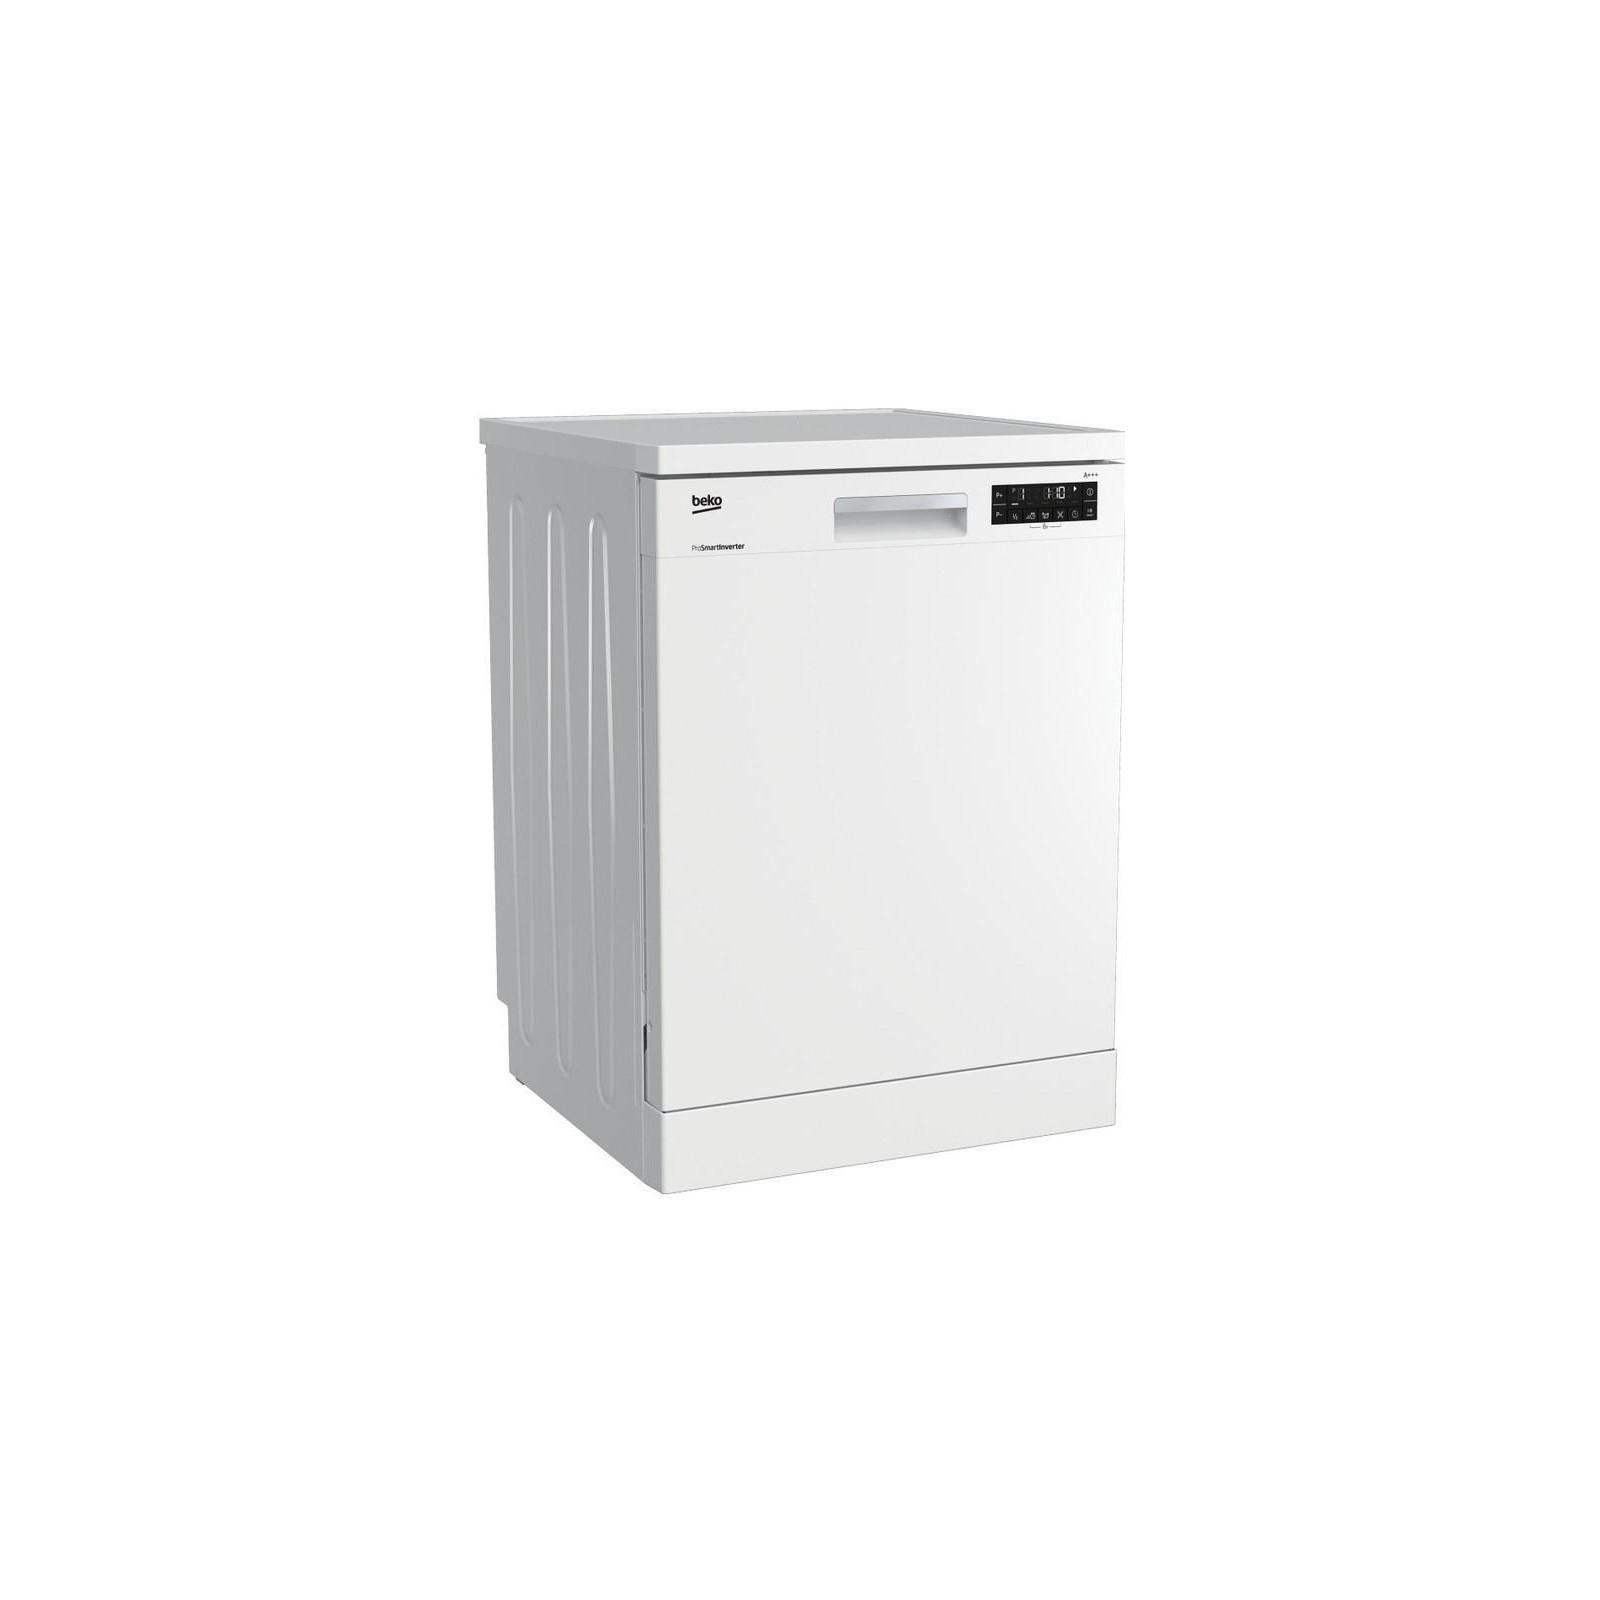 Посудомоечная машина BEKO DFN 28321 W (DFN28321W)